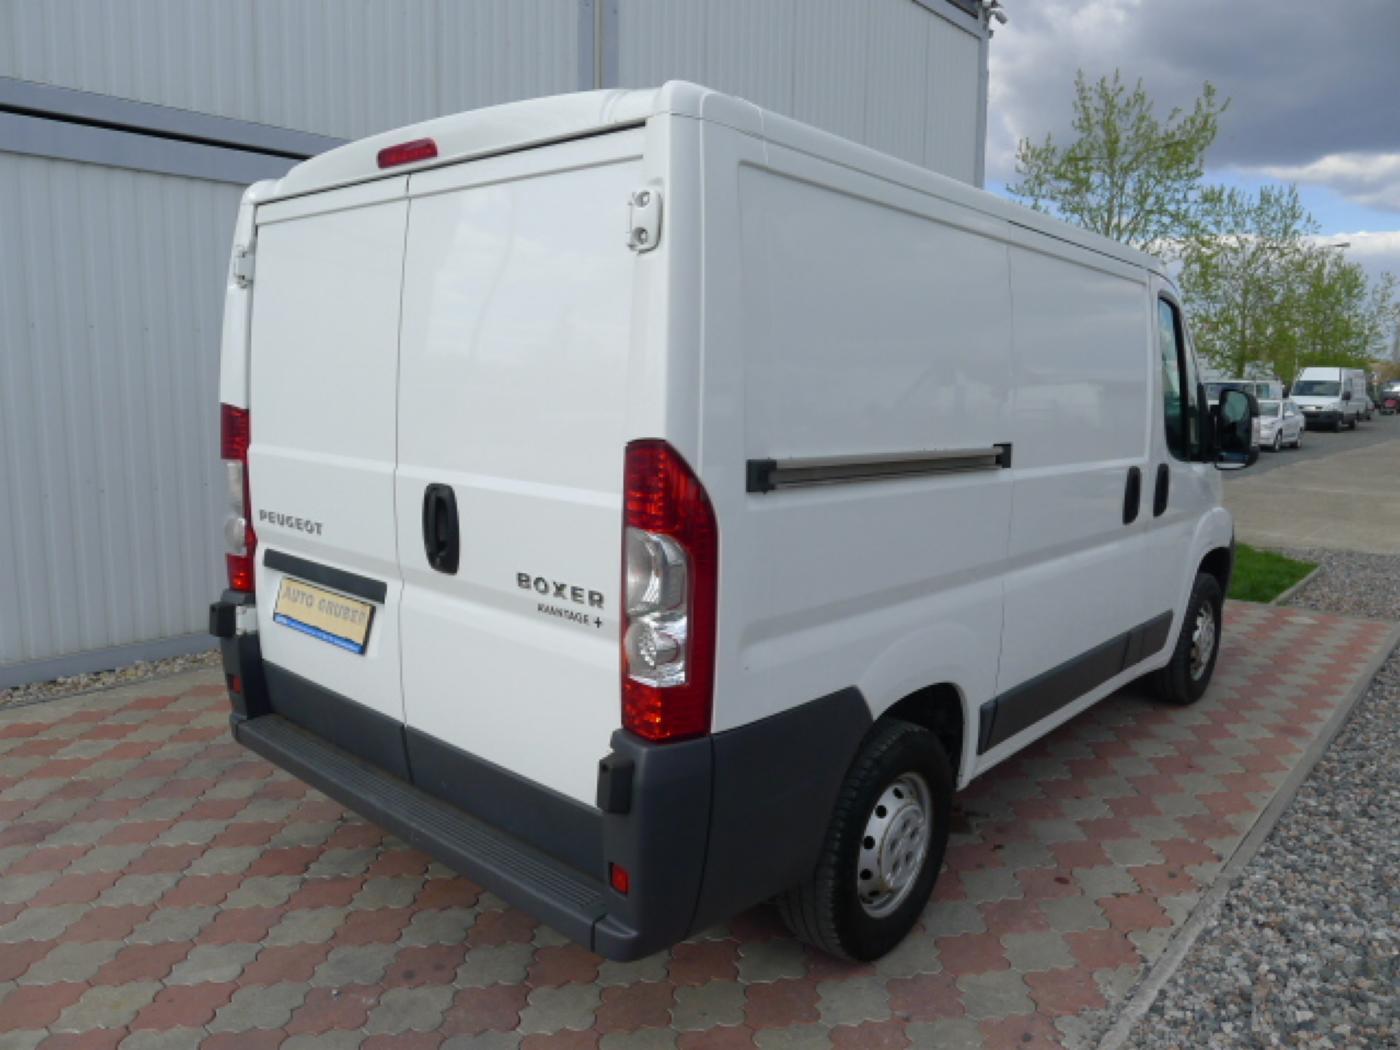 Peugeot Boxer 2.2 HDI L1H1 Klima Akce!!! Novinka - 3